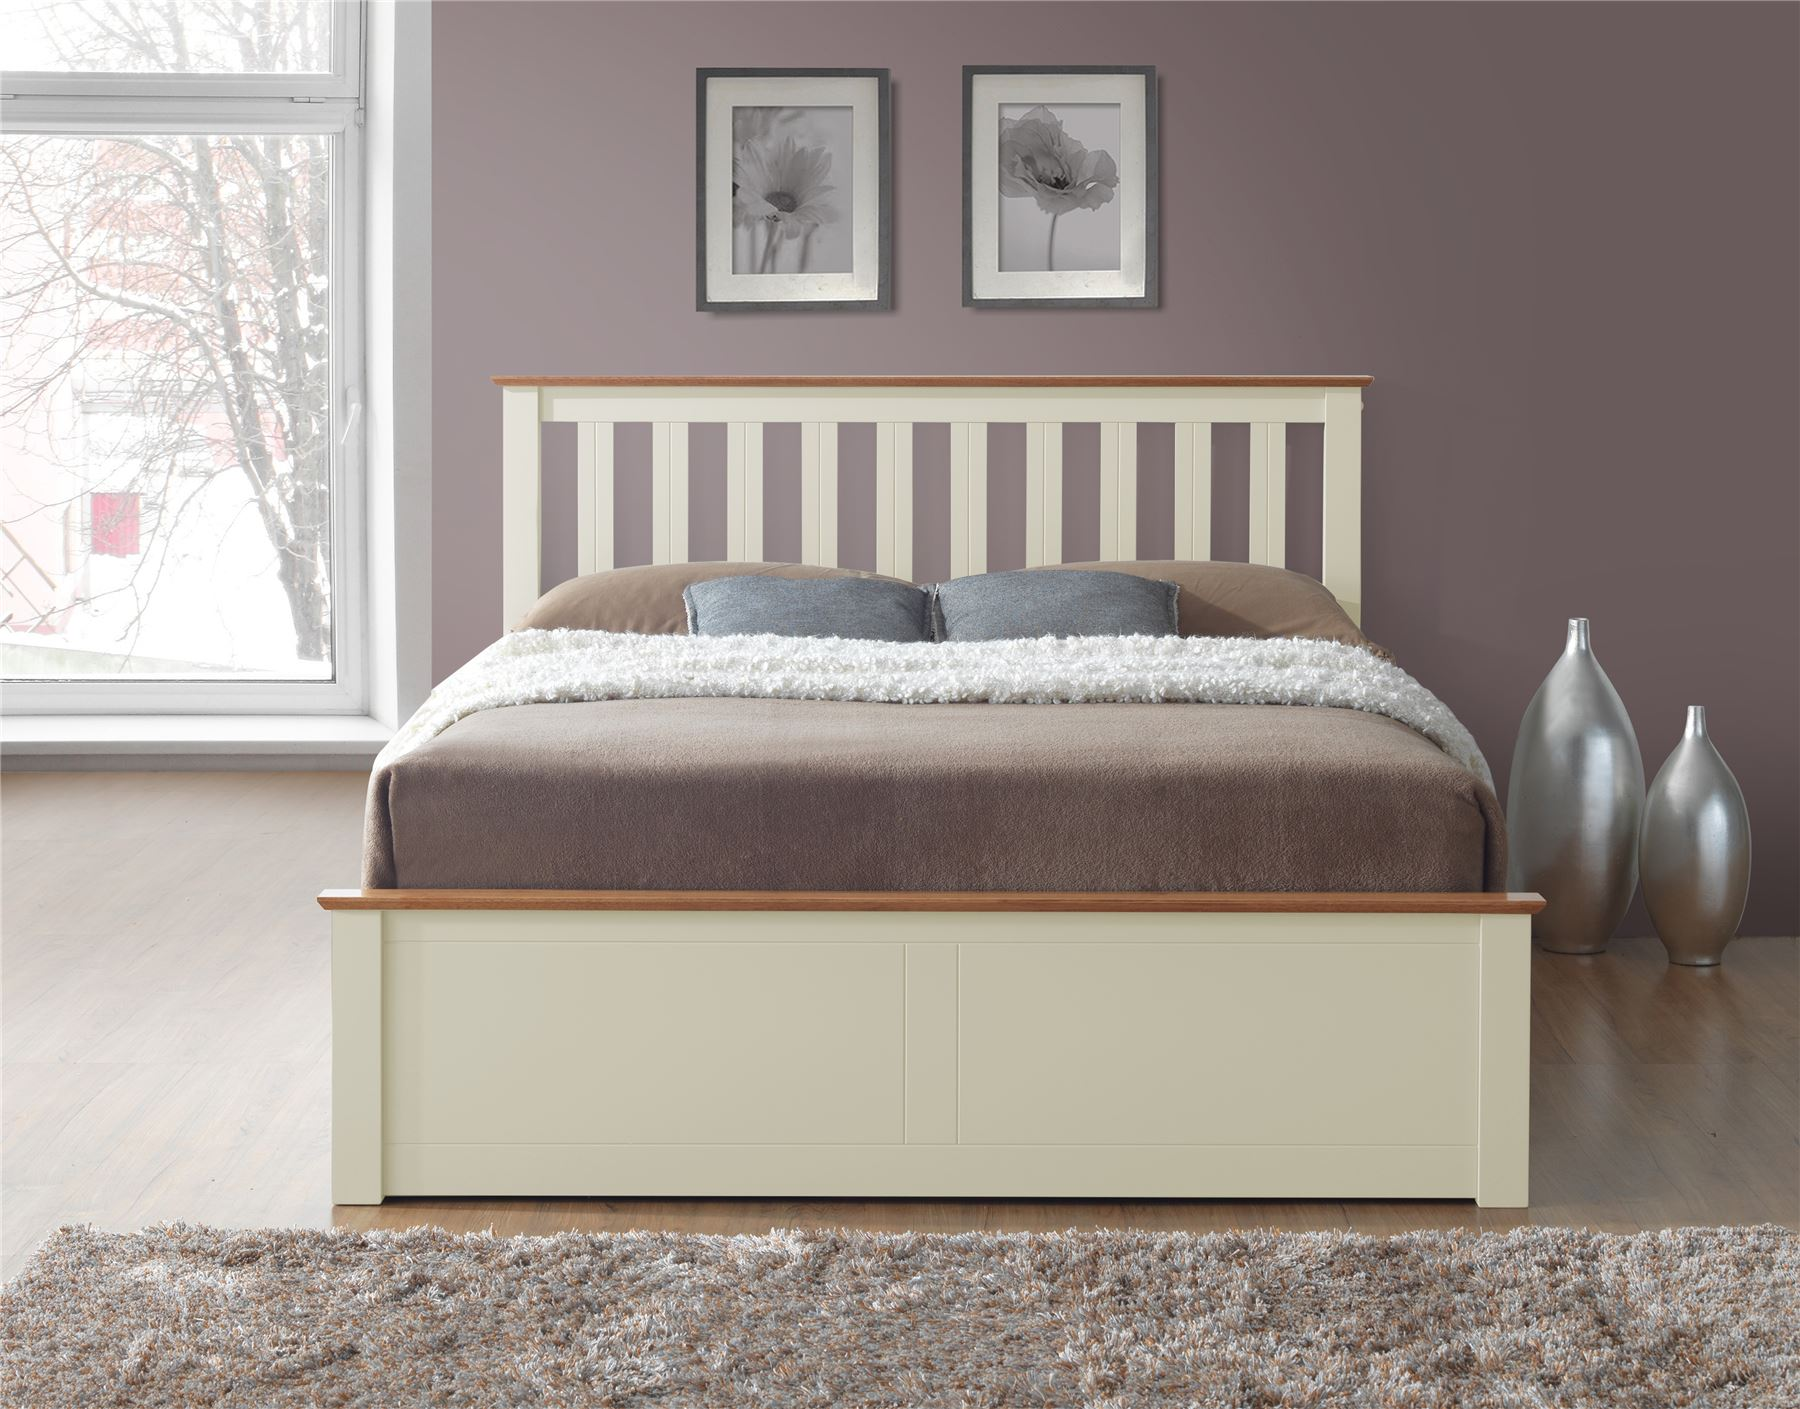 phoenix wood ottoman bed frame storage double 4ft6 cream. Black Bedroom Furniture Sets. Home Design Ideas